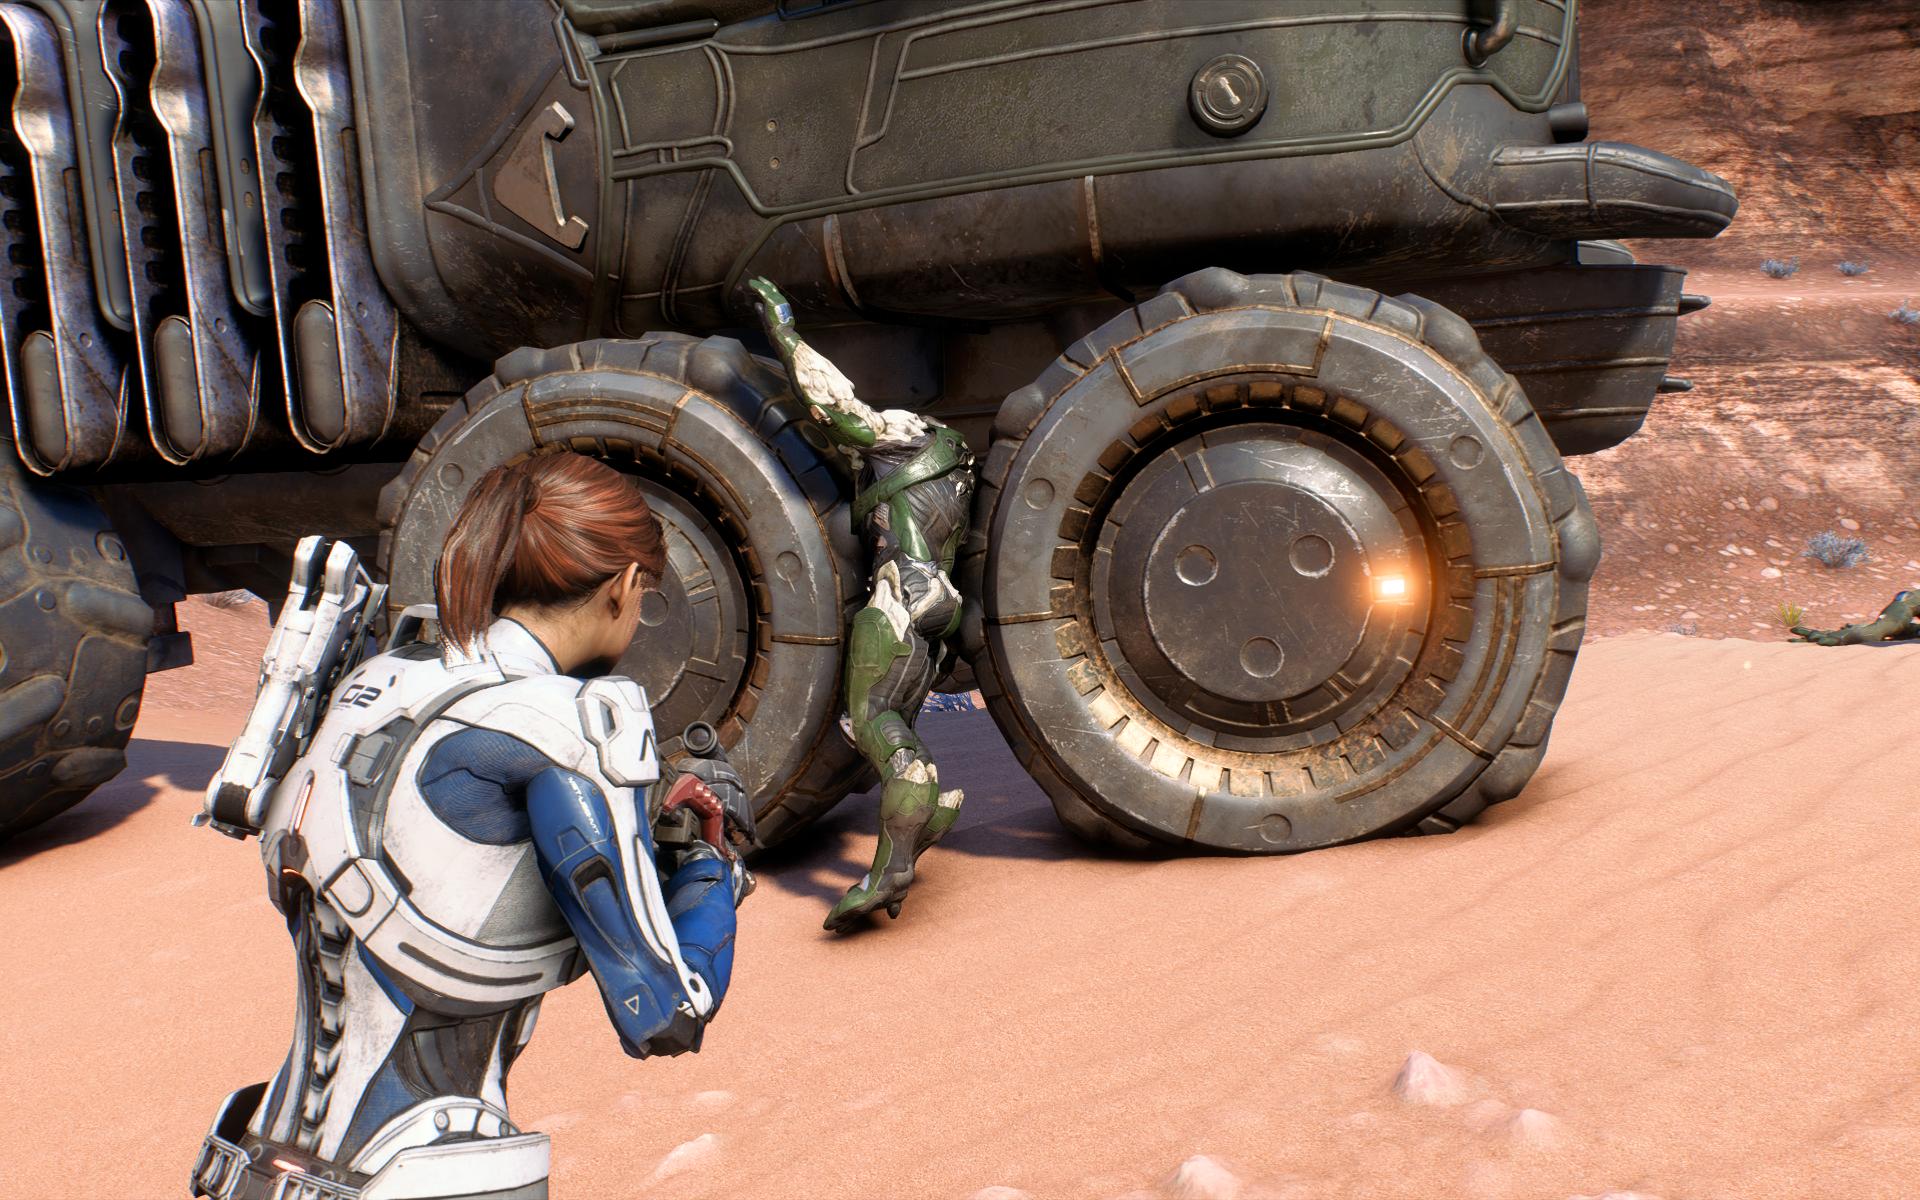 Mass Effect Andromeda Screenshot  - 09.39.15.37.png - Mass Effect: Andromeda